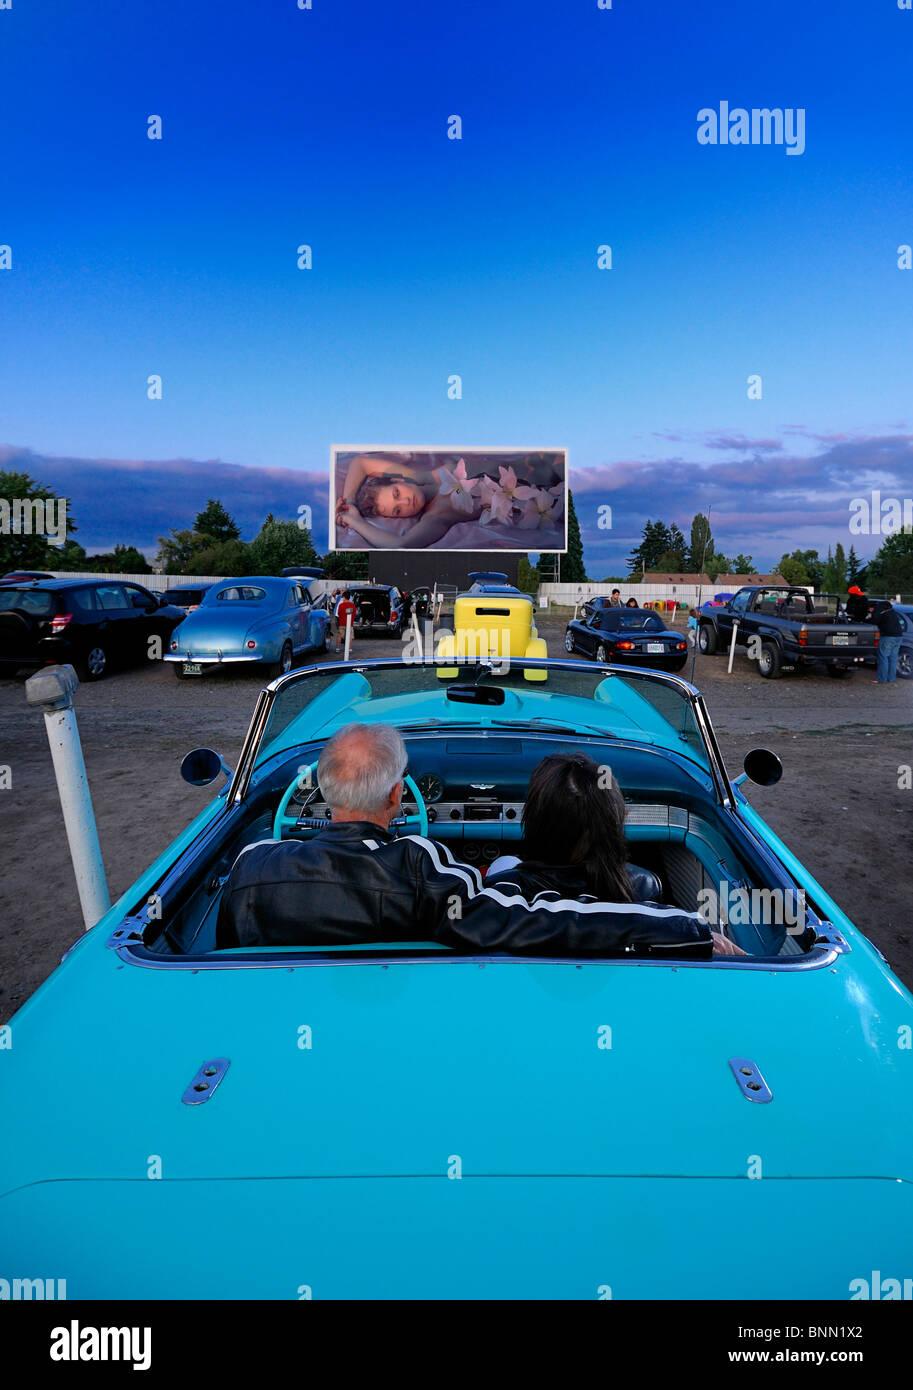 Mann Frau paar Oldtimer 1955 T-Bird Motor Vu fahren In Dallas Oregon USA Kino Parken Stockbild